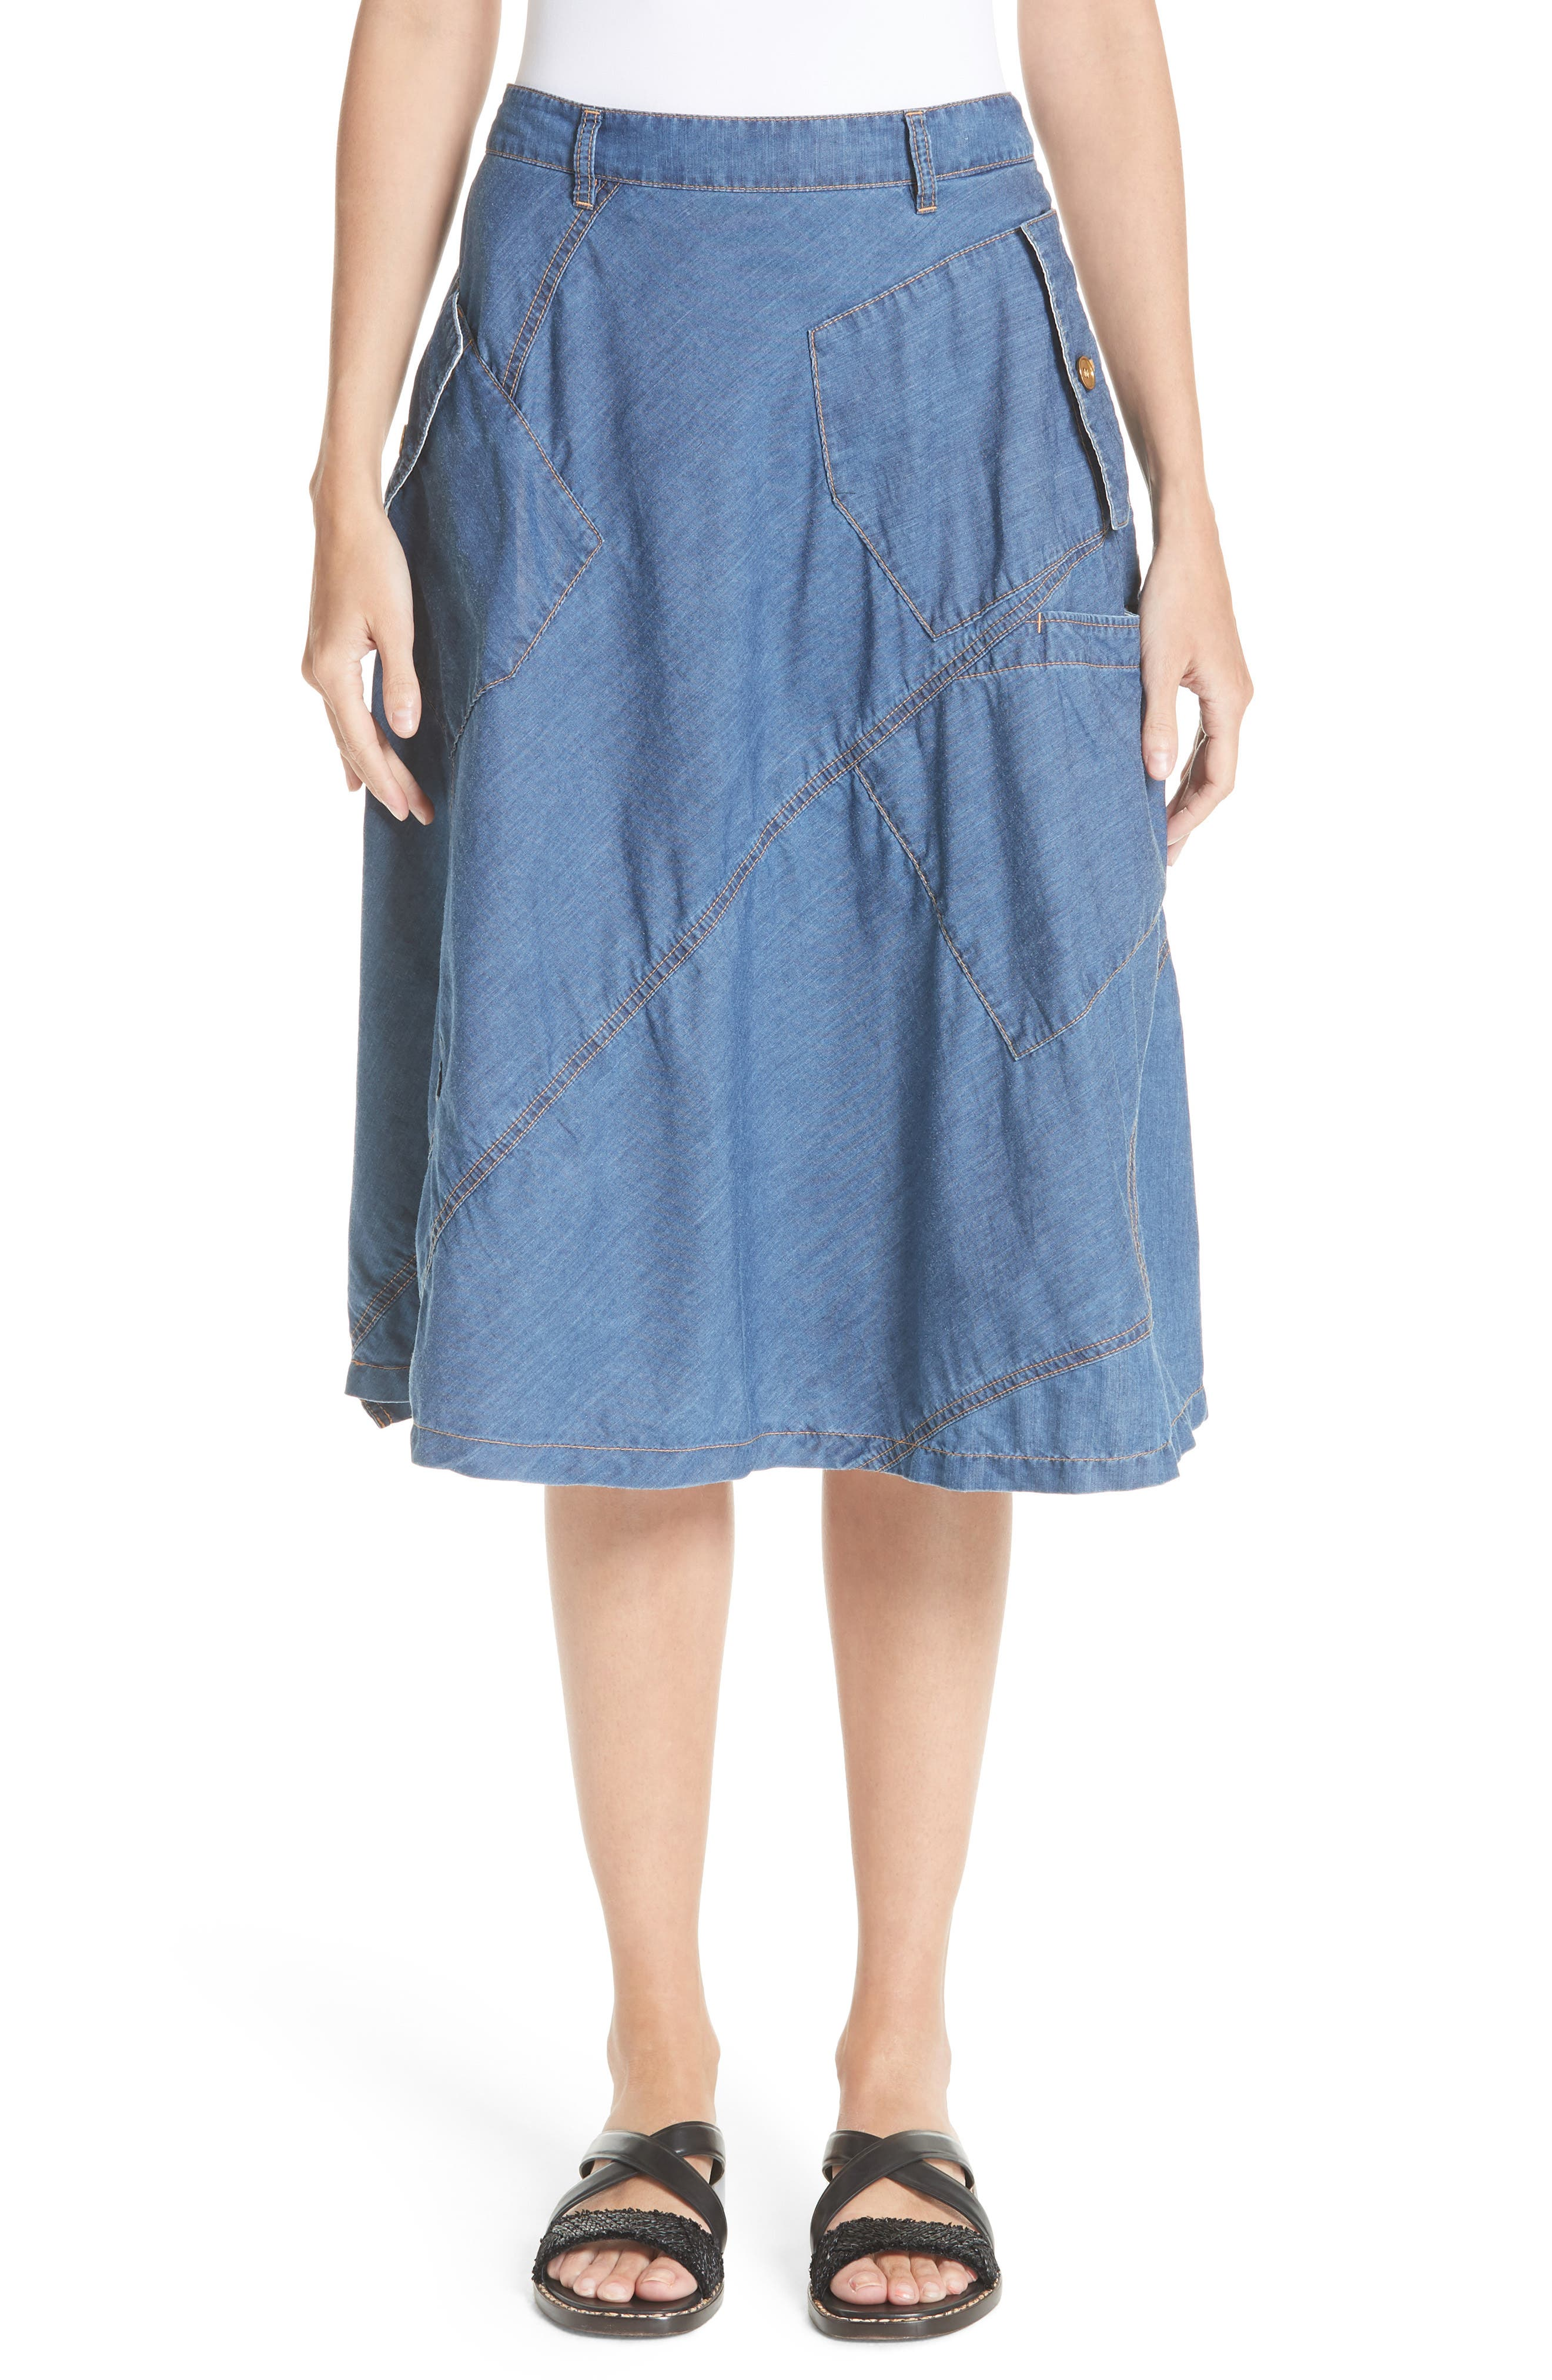 Tricot Comme des Garçons Chambray & Eyelet Skirt